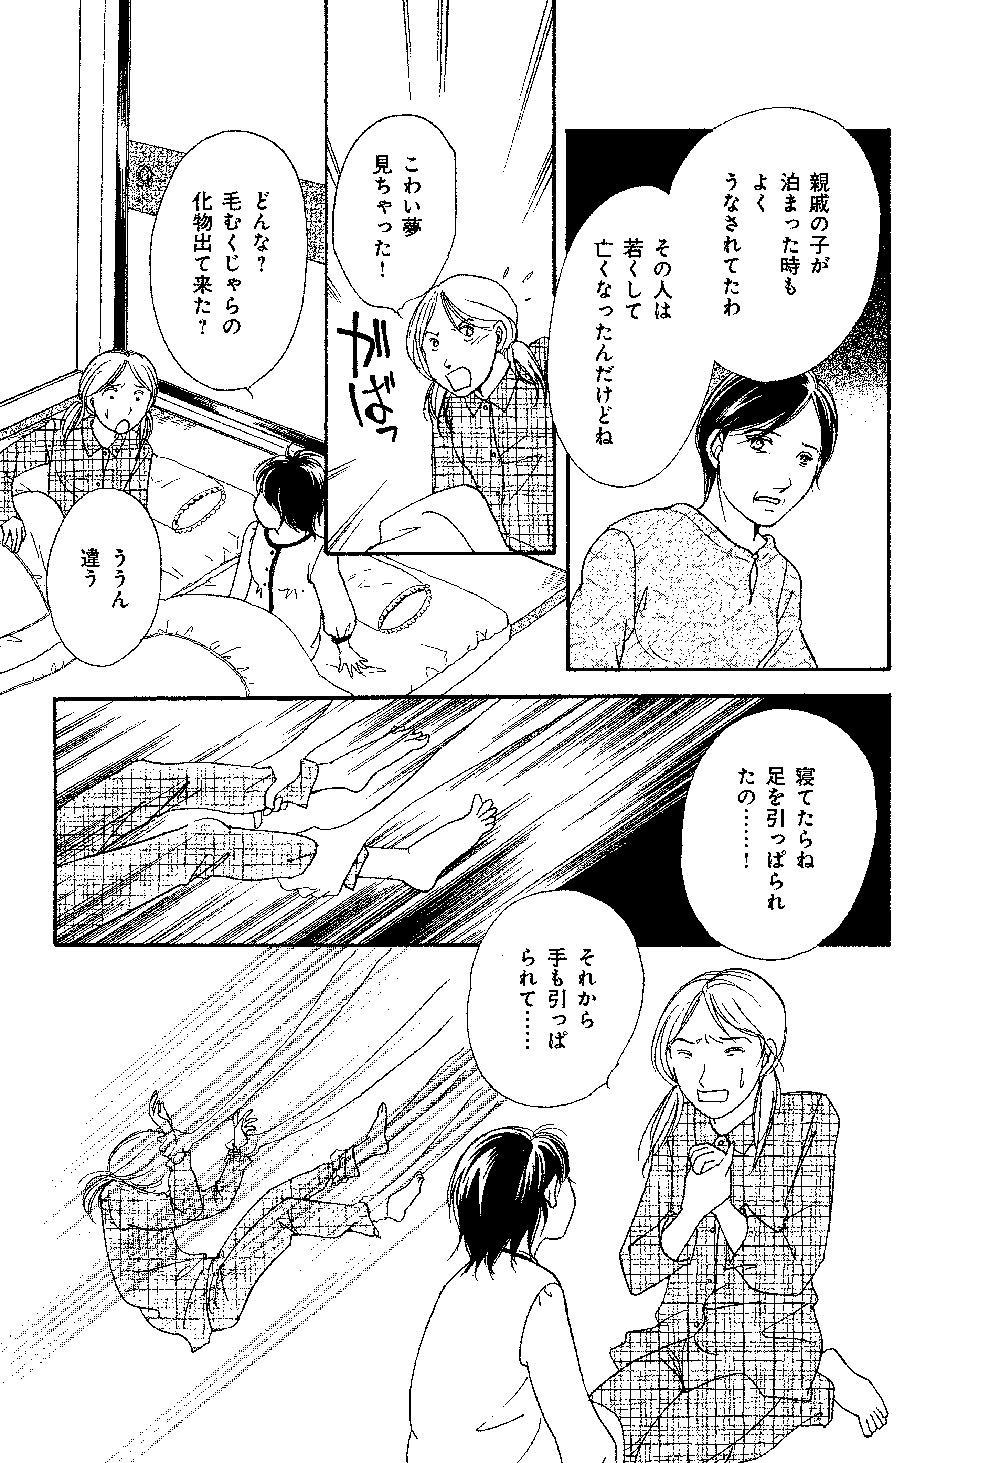 mayuri_0001_0069.jpg